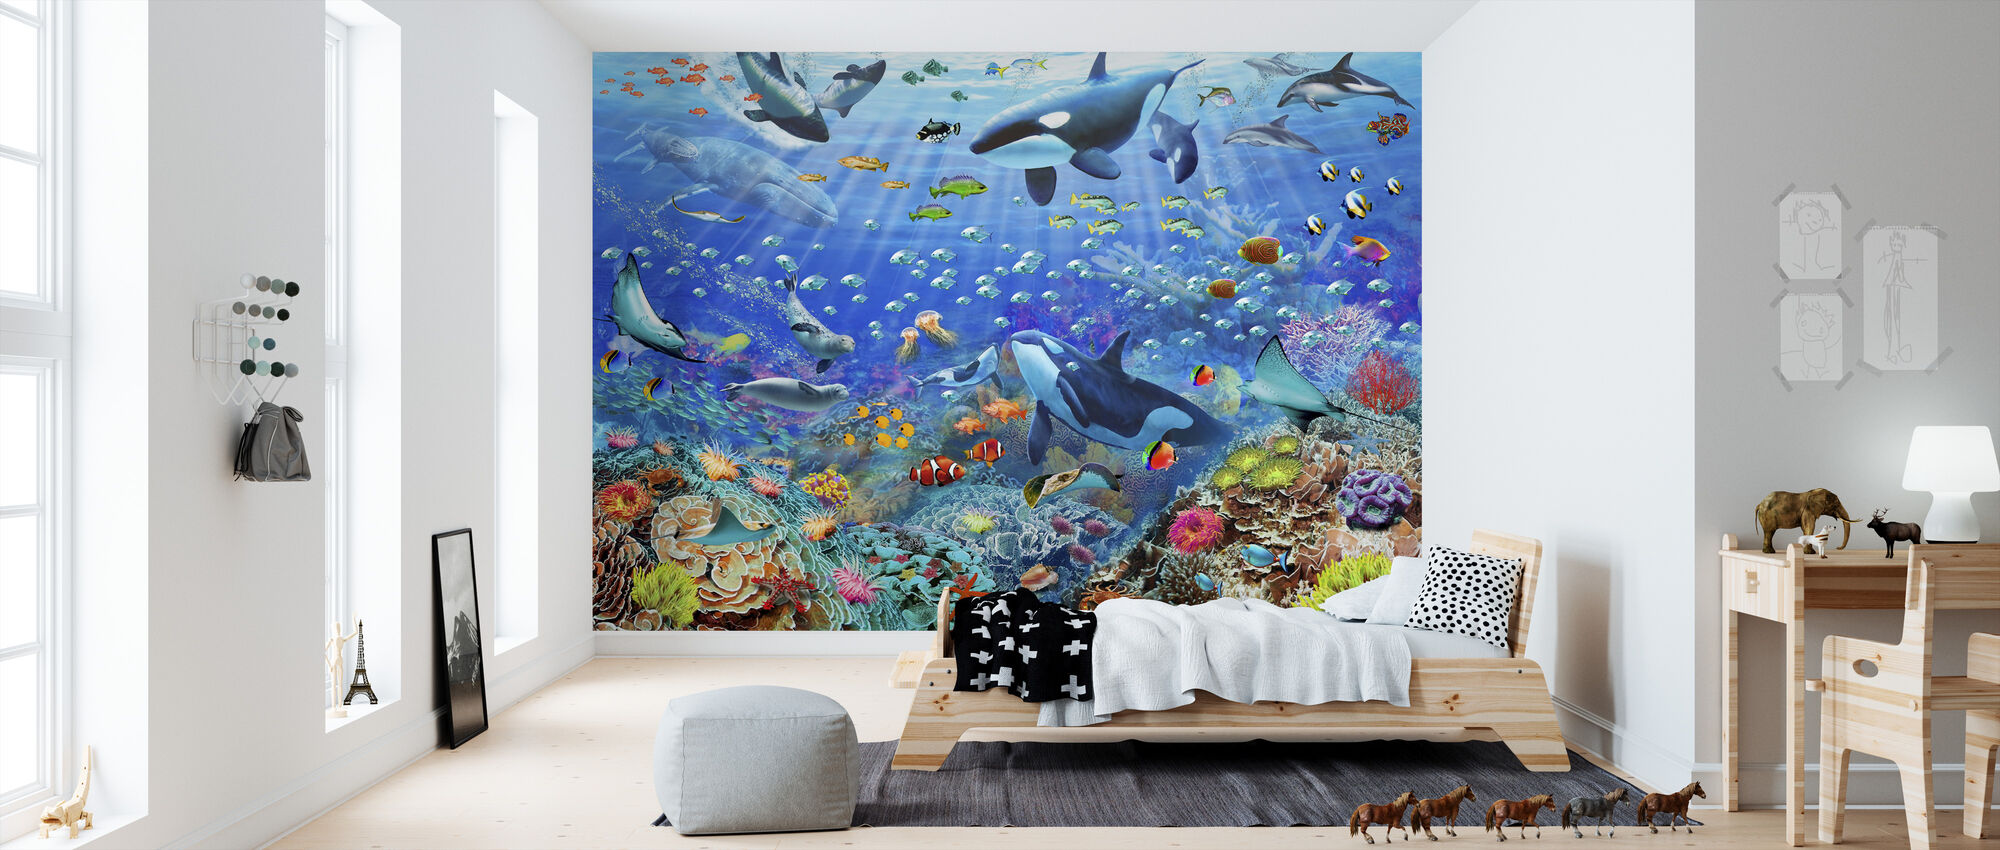 Underwater Scene - Wallpaper - Kids Room